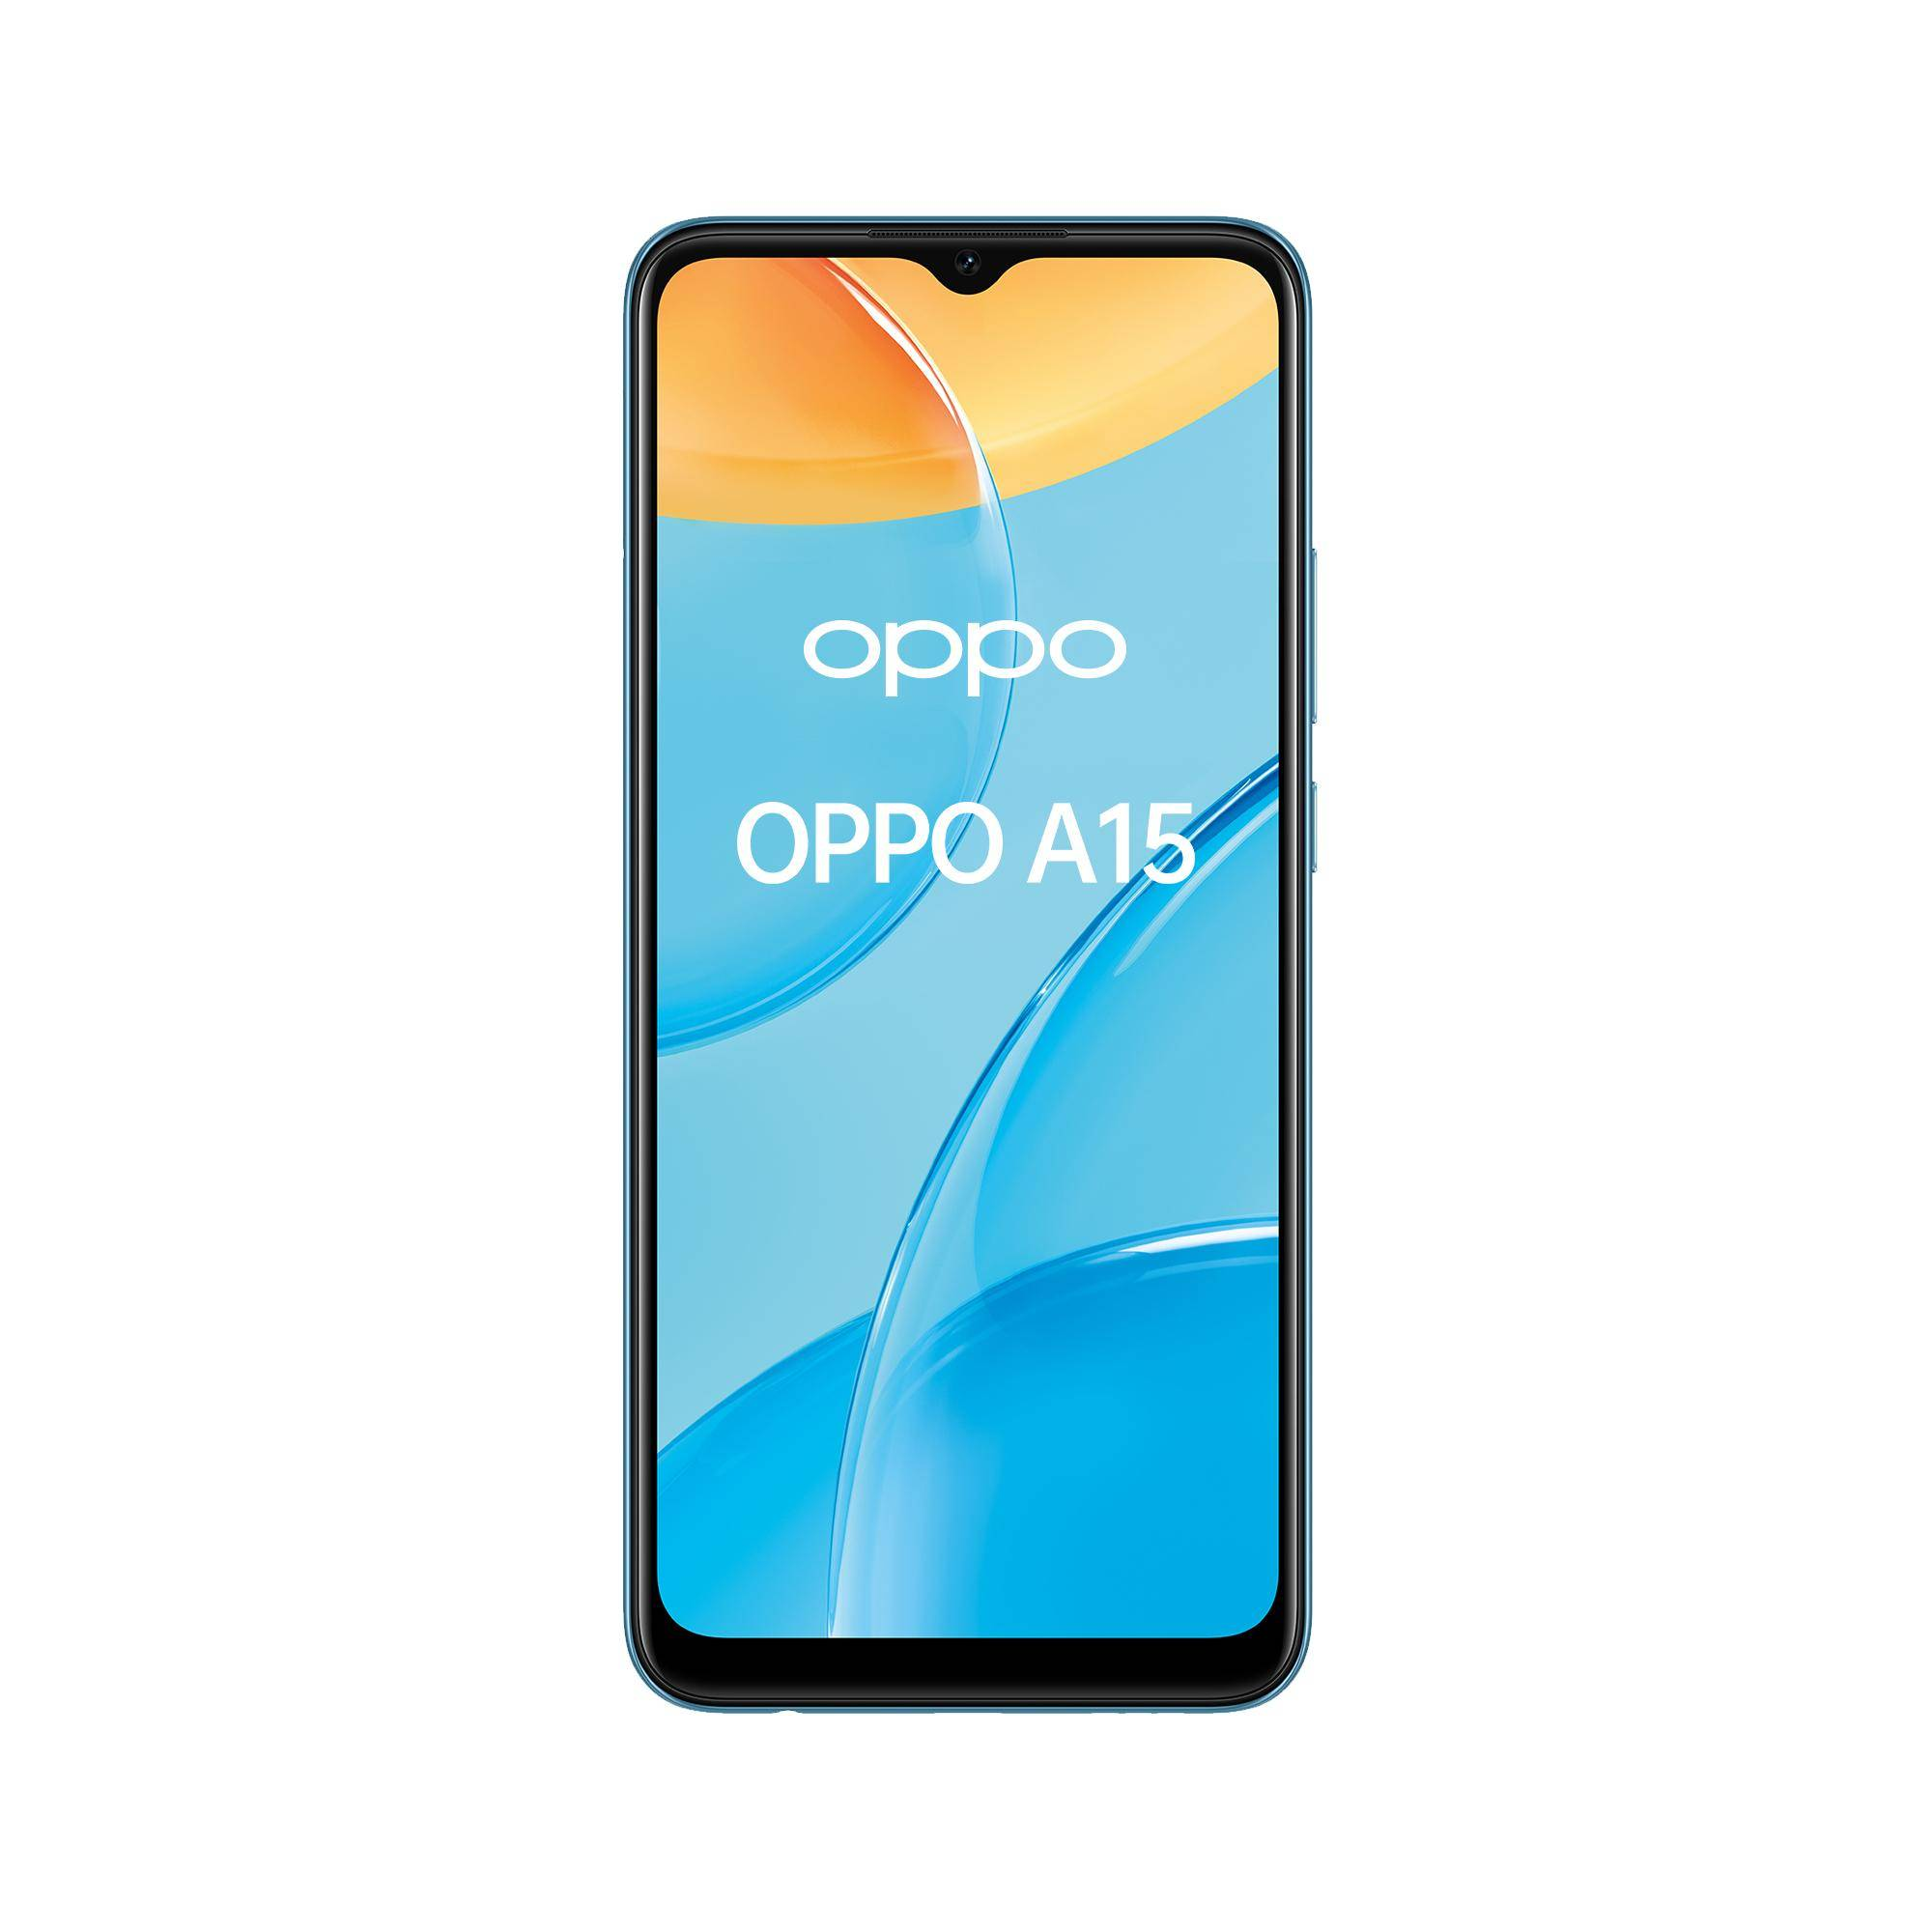 "Oppo A15 Smartphone, 179g, Display 6.52"" HD+ LCD, 3 Fotocamere 13MP, RAM 3GB + ROM 32GB Espandibile, Batteria 4230mAh, Ricarica Rapida, Dual Sim, [Versione Italiana], Mistery Blue"